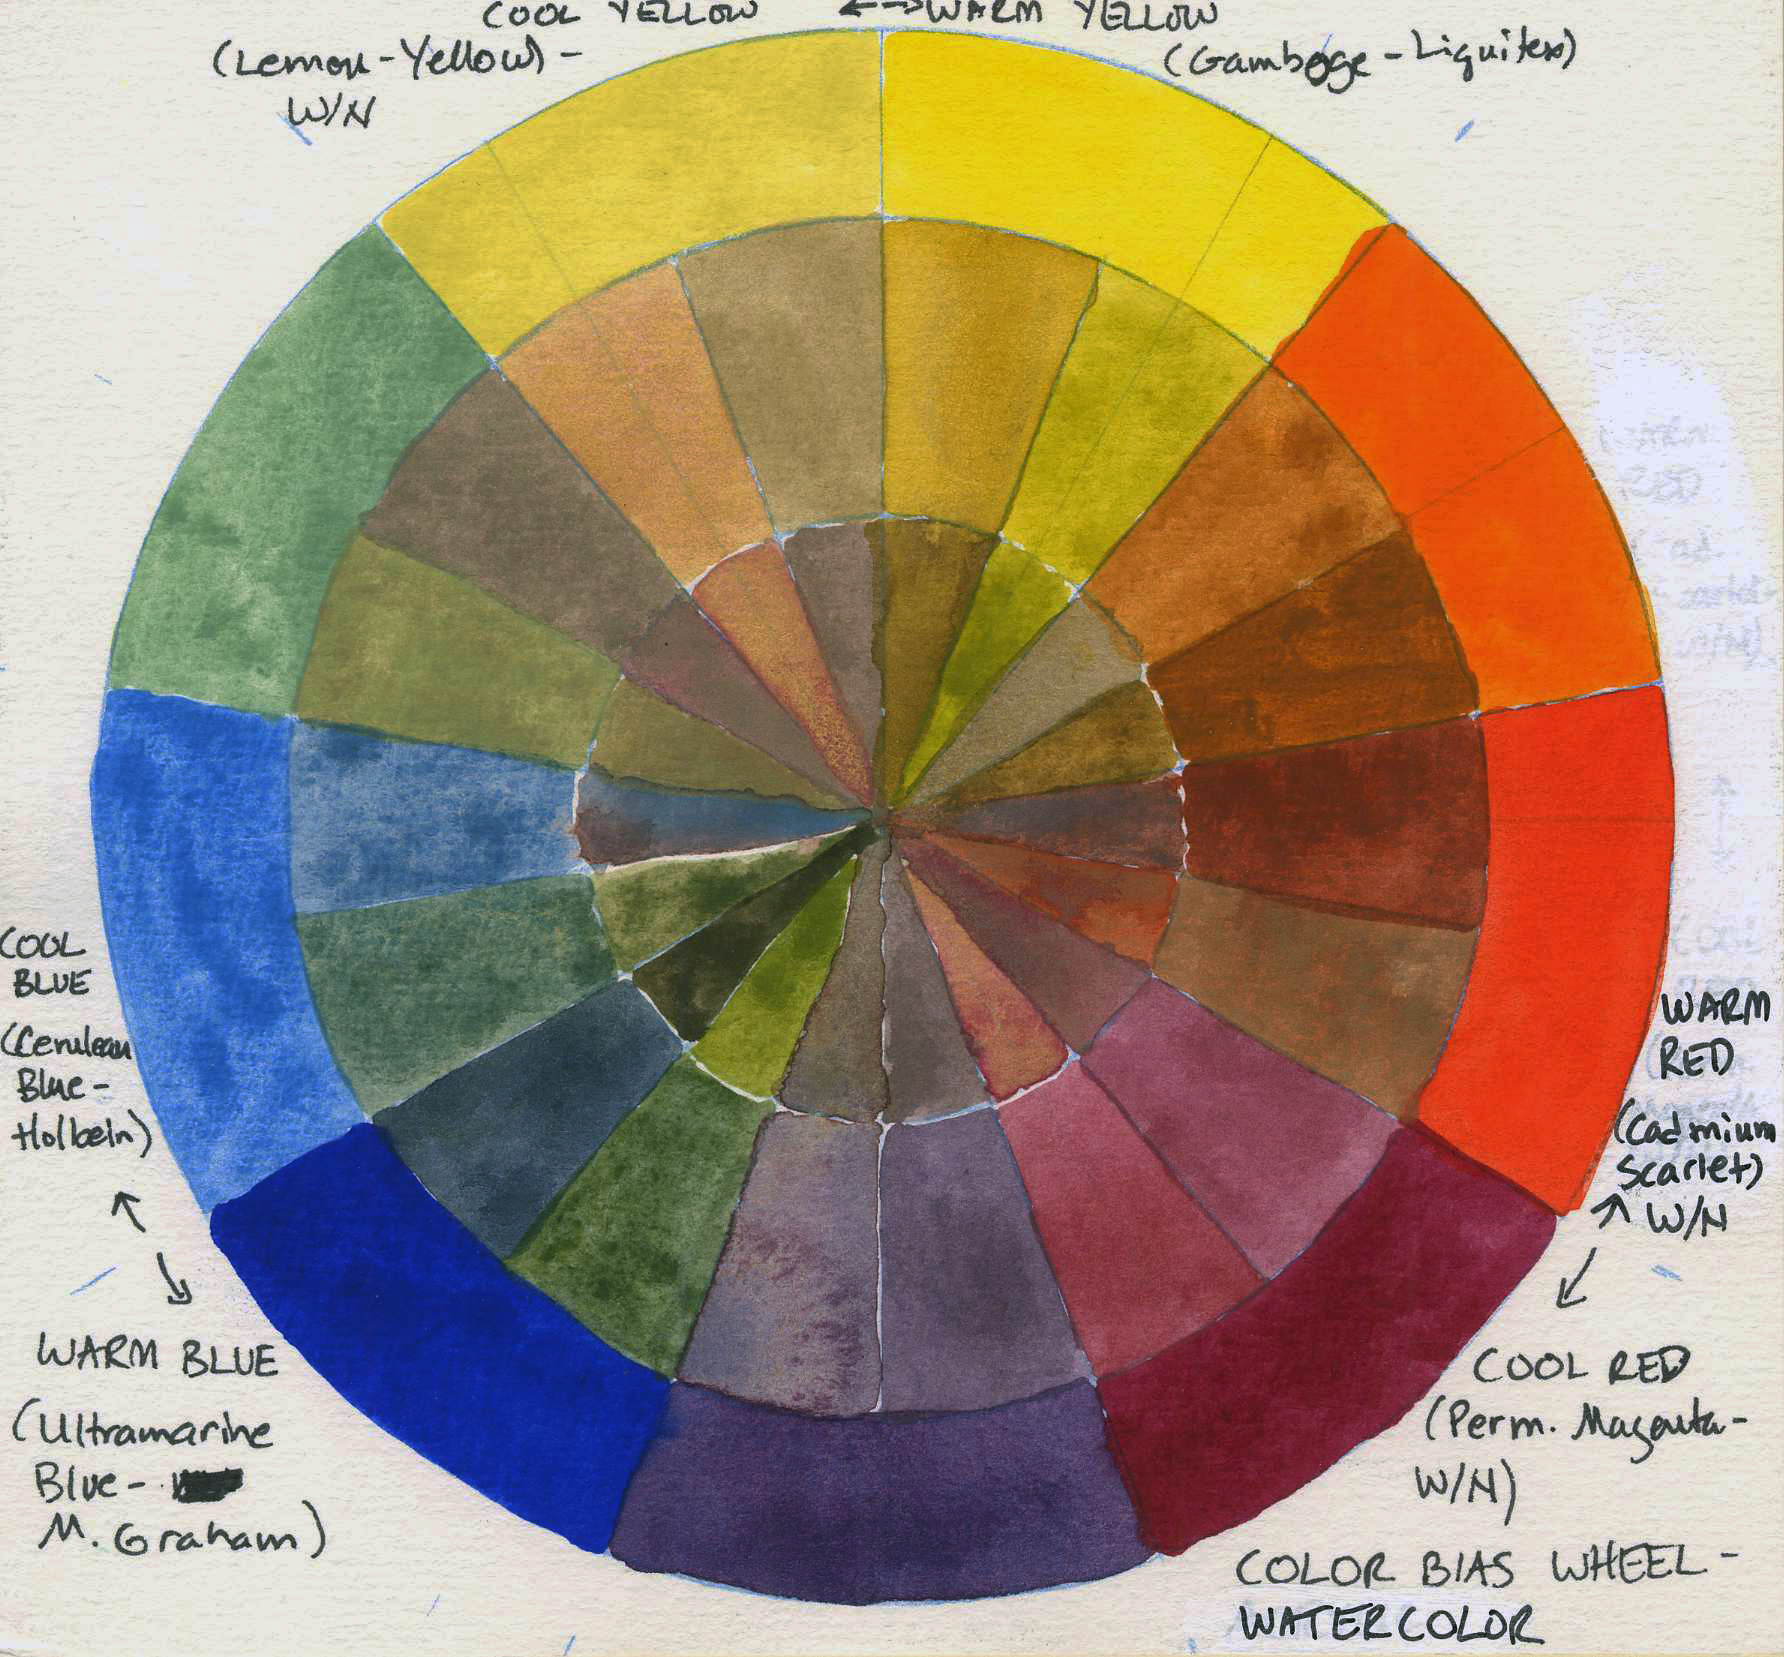 Color-mixing-chart-Watercolor-6-color-1-038